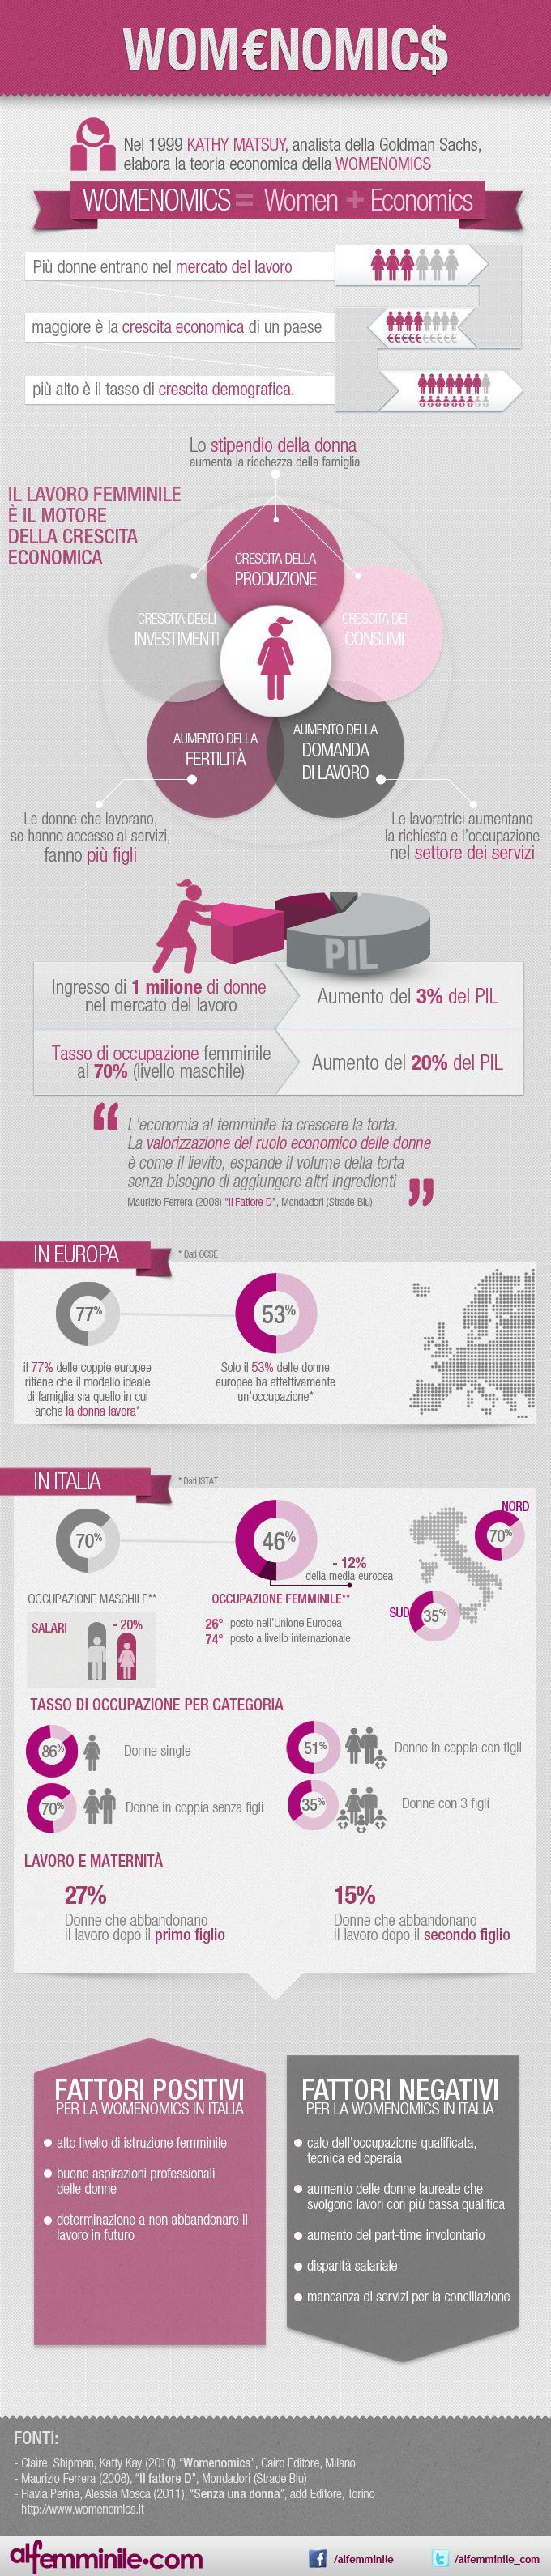 Womenomics: infografica